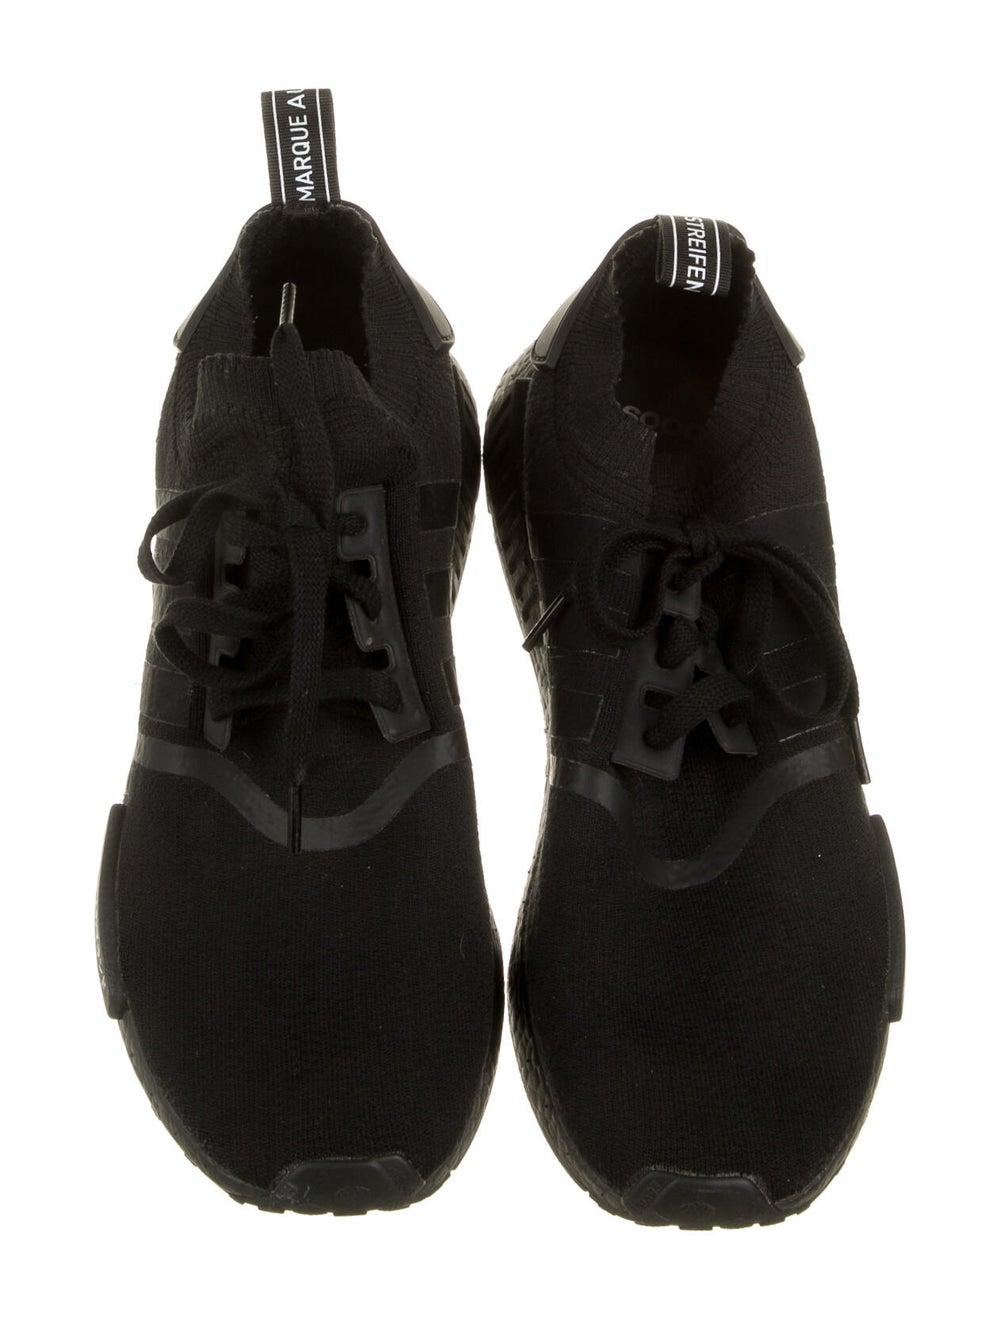 Adidas Athletic Sneakers Black - image 3